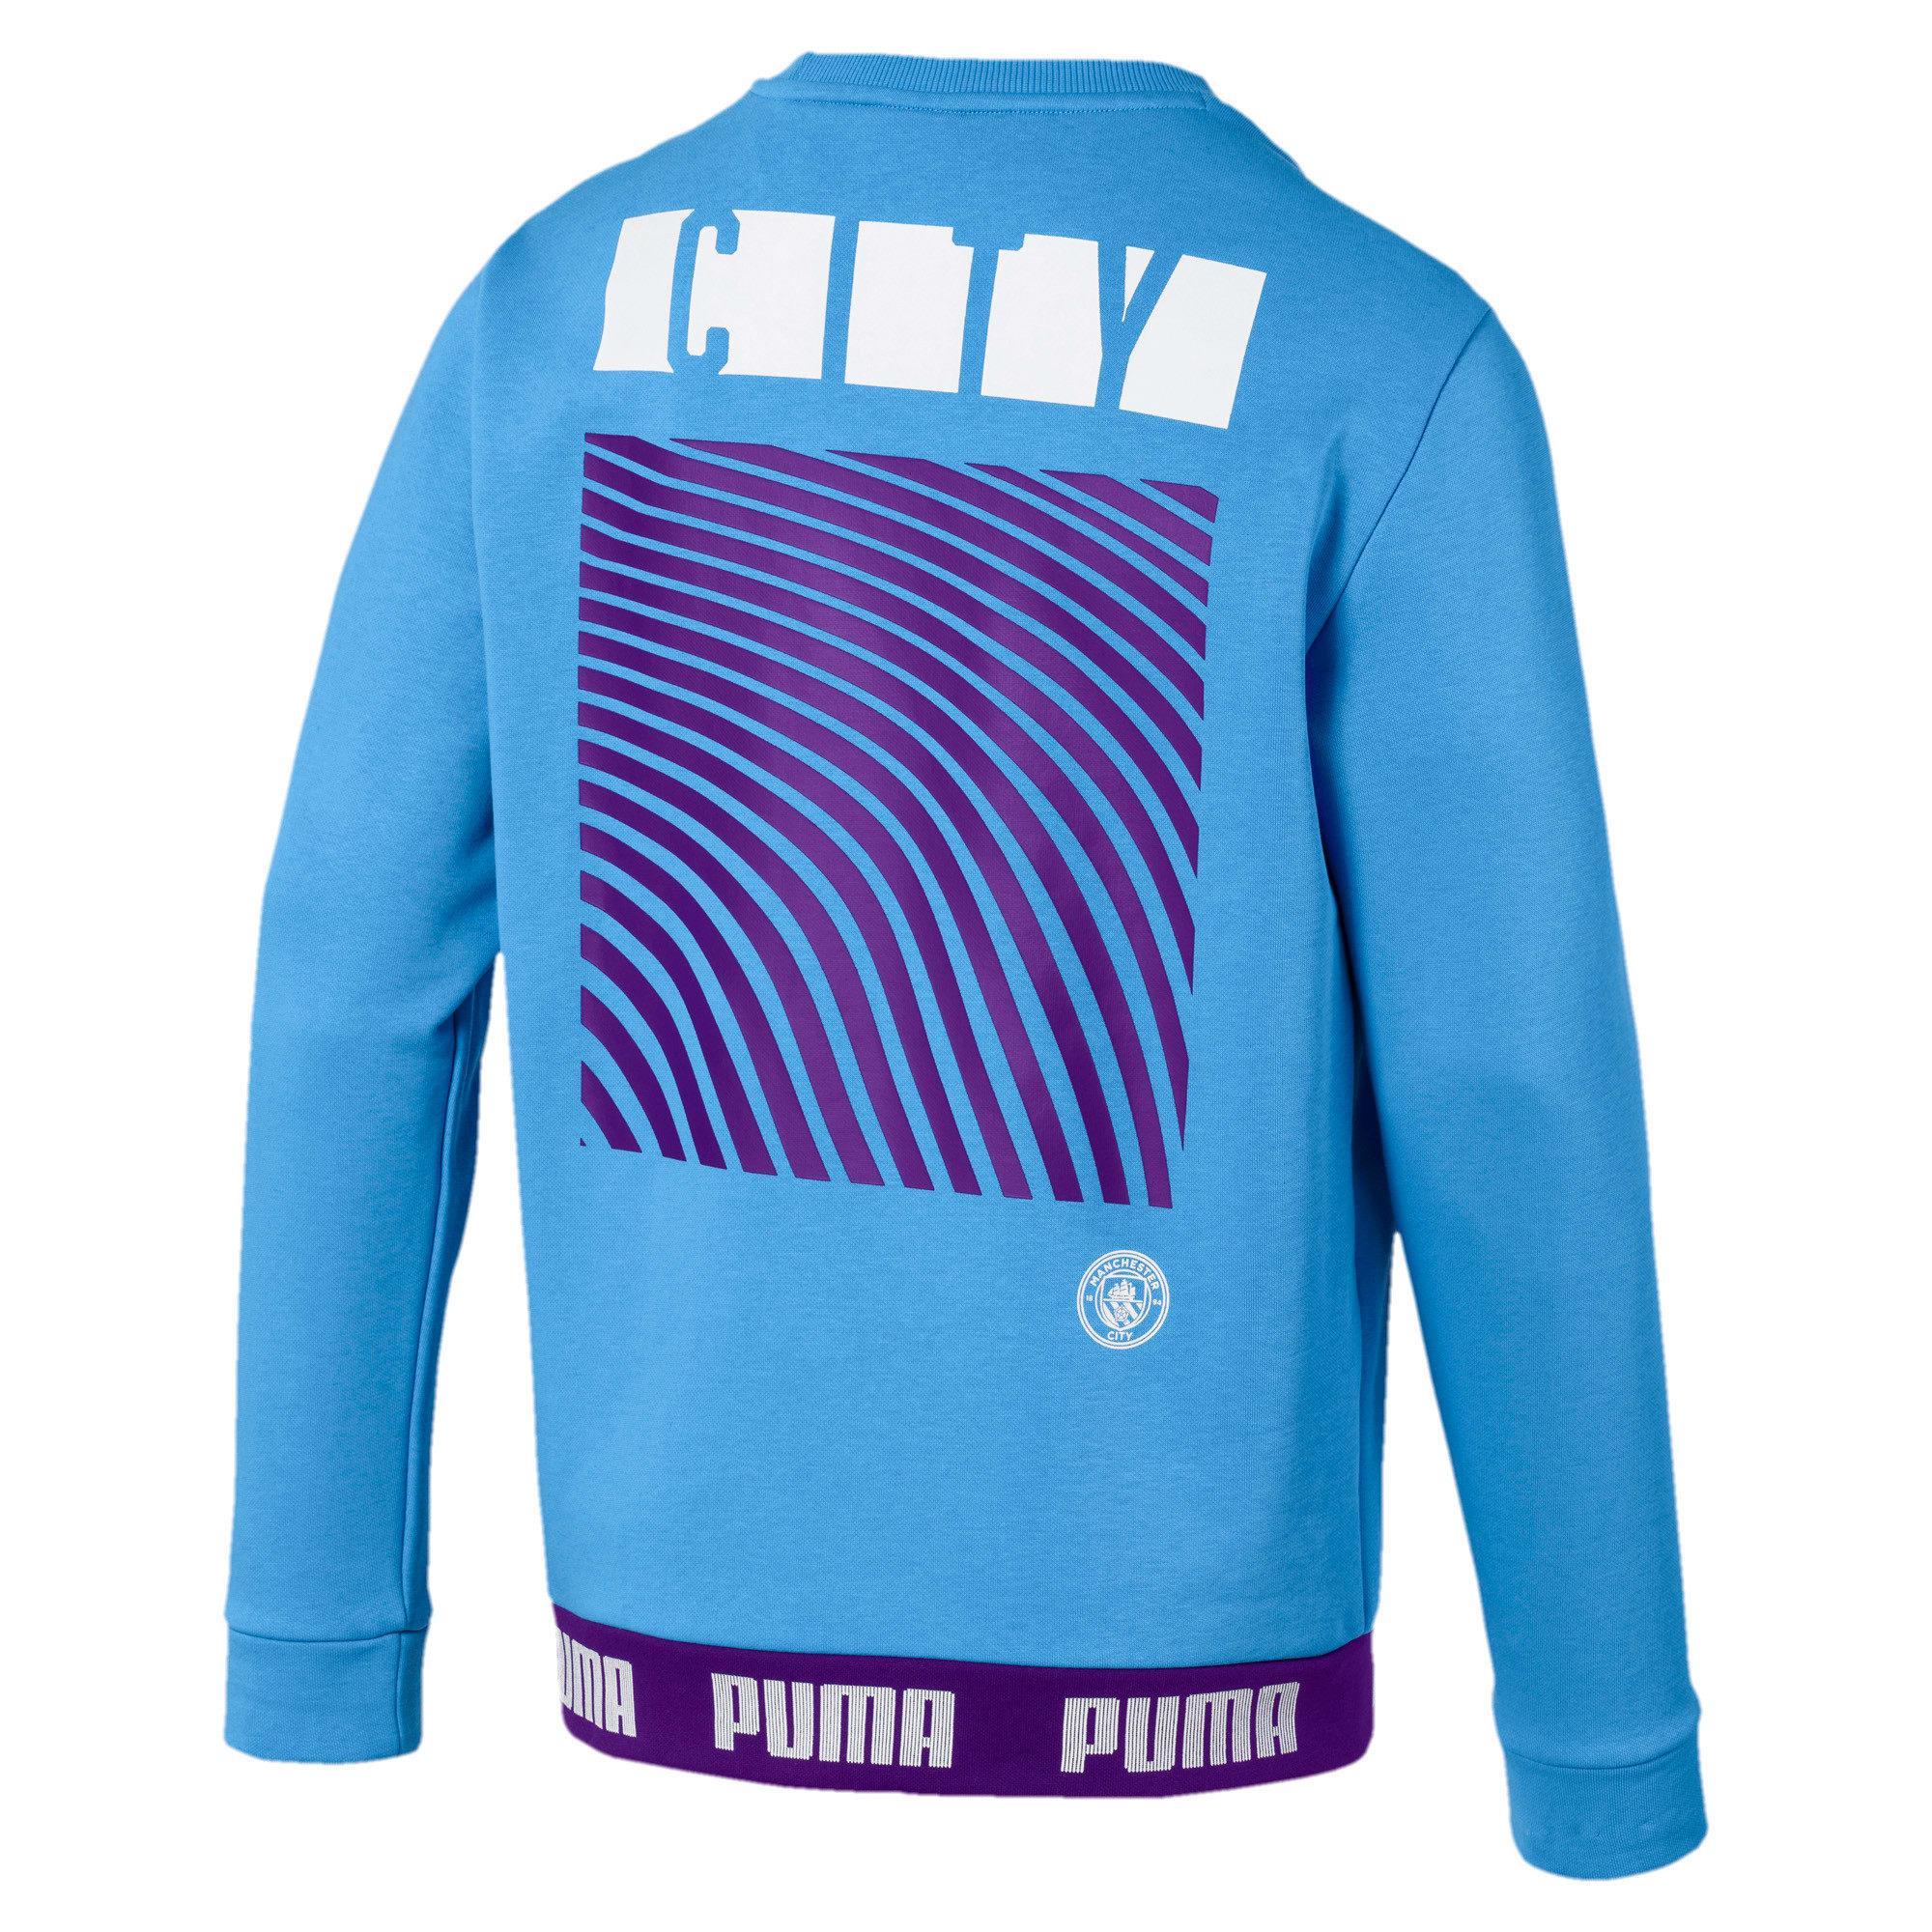 Thumbnail 5 of Manchester City FC FtblCulture Men's Sweatshirt, Team Light Blue-Puma White, medium